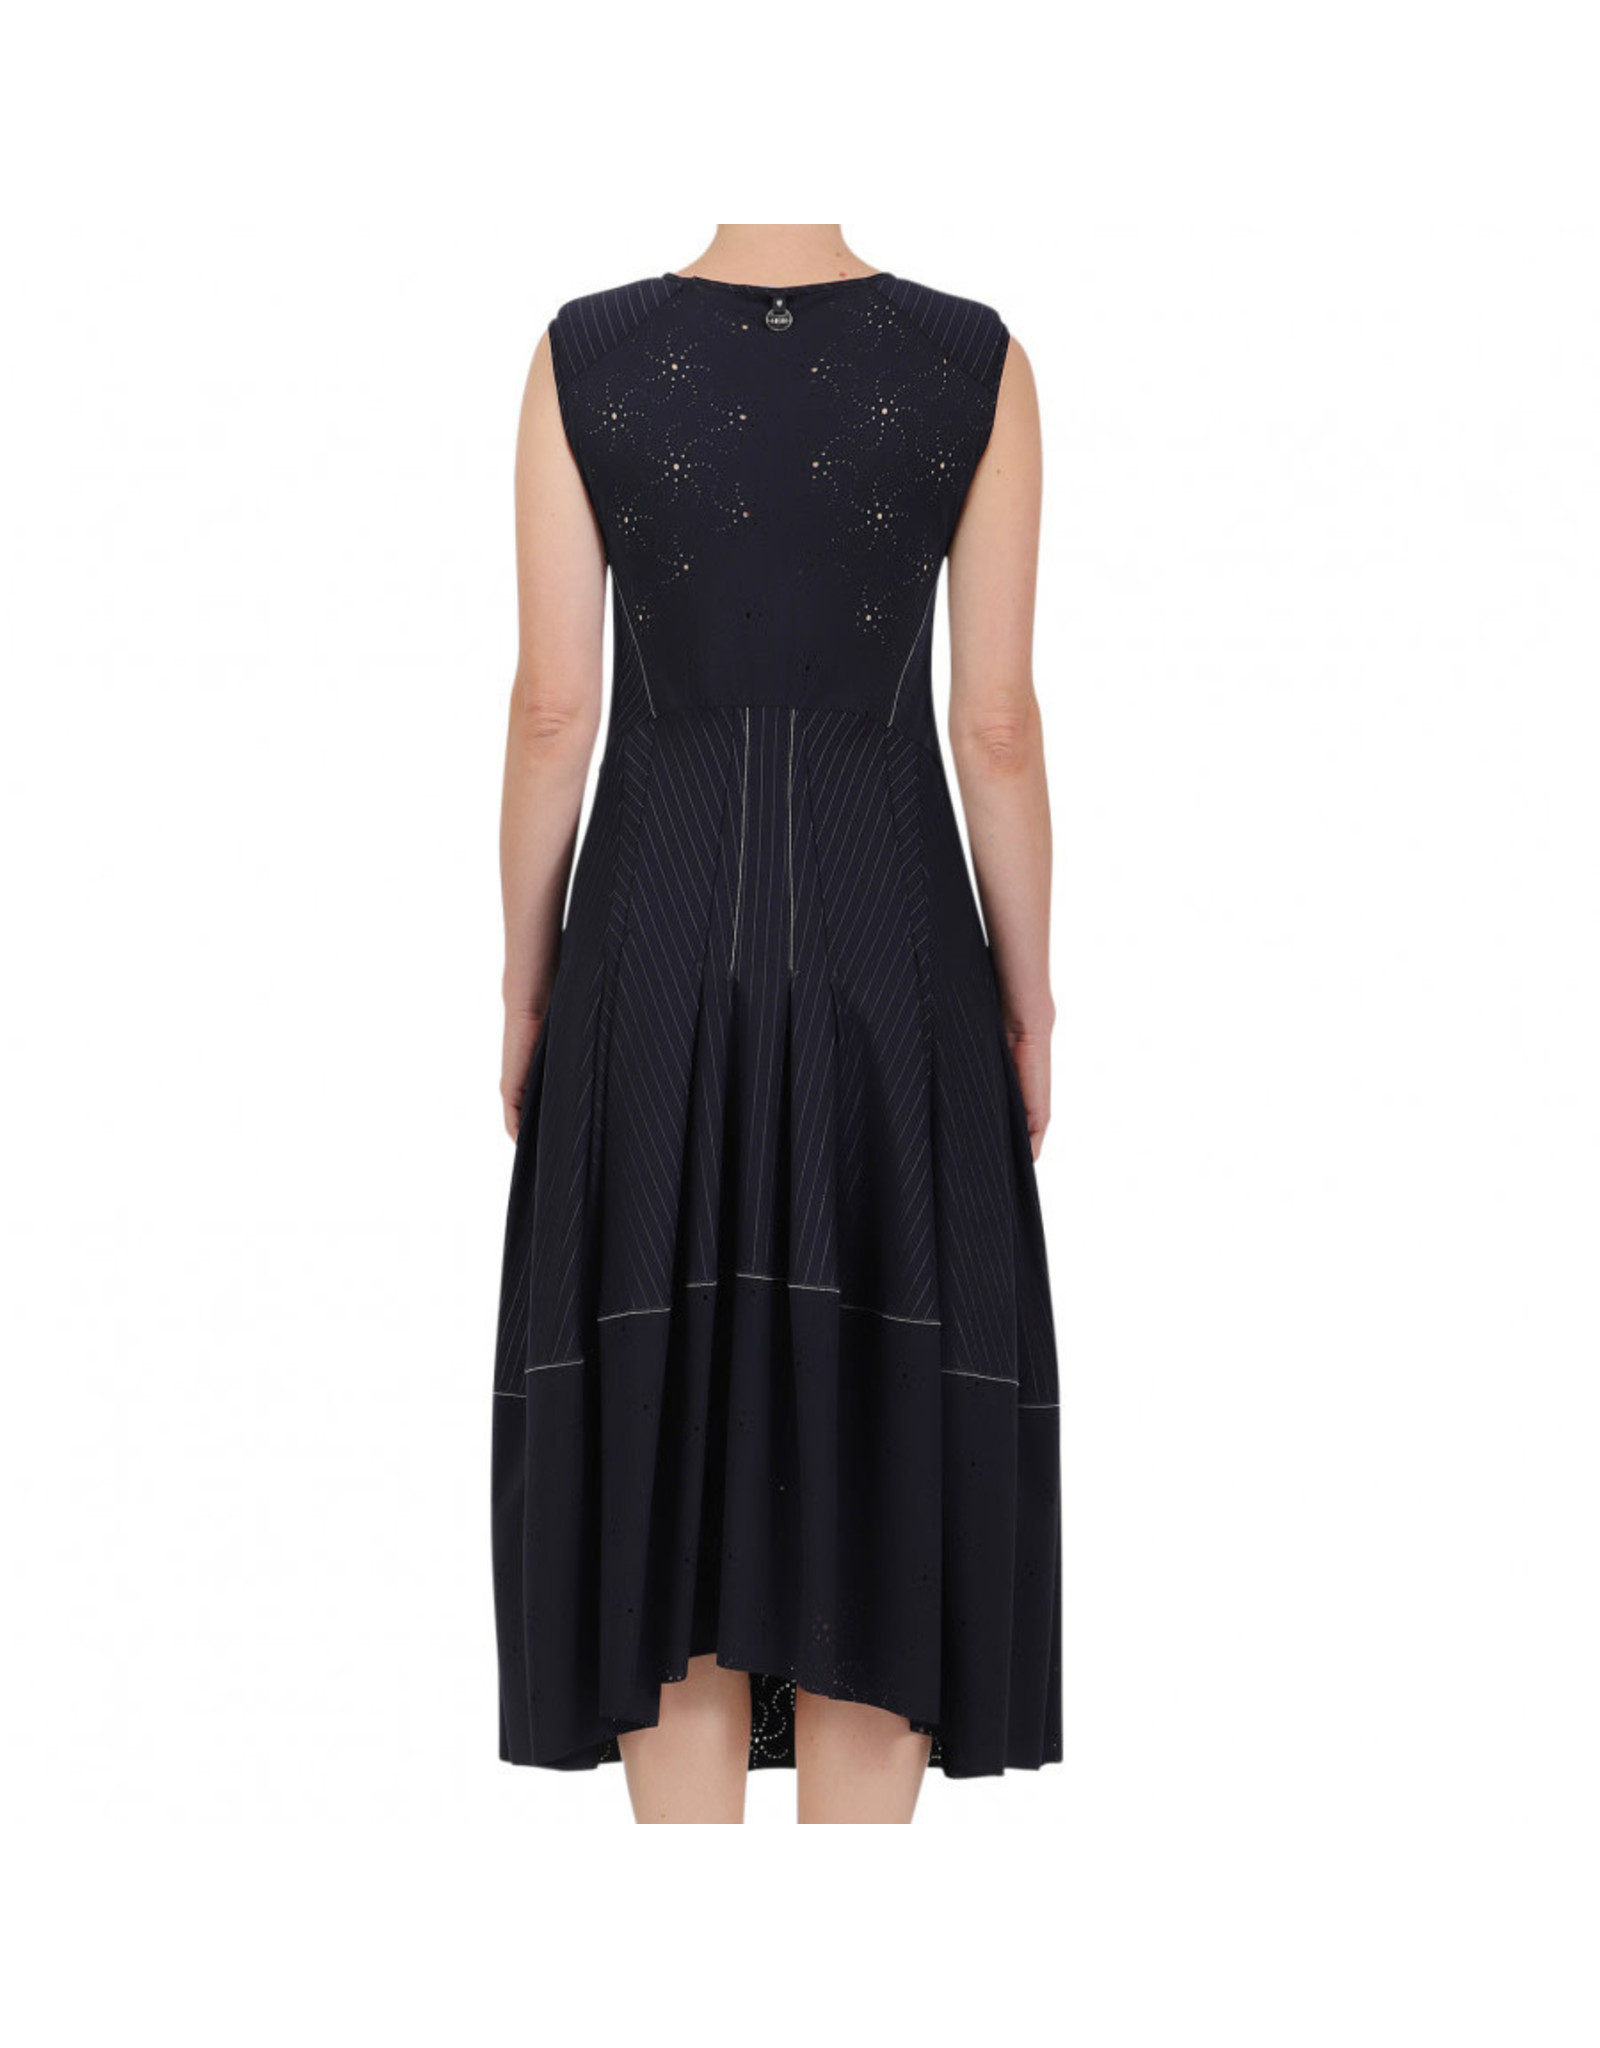 HIGH HIGH Mesmerize Dress - Navy